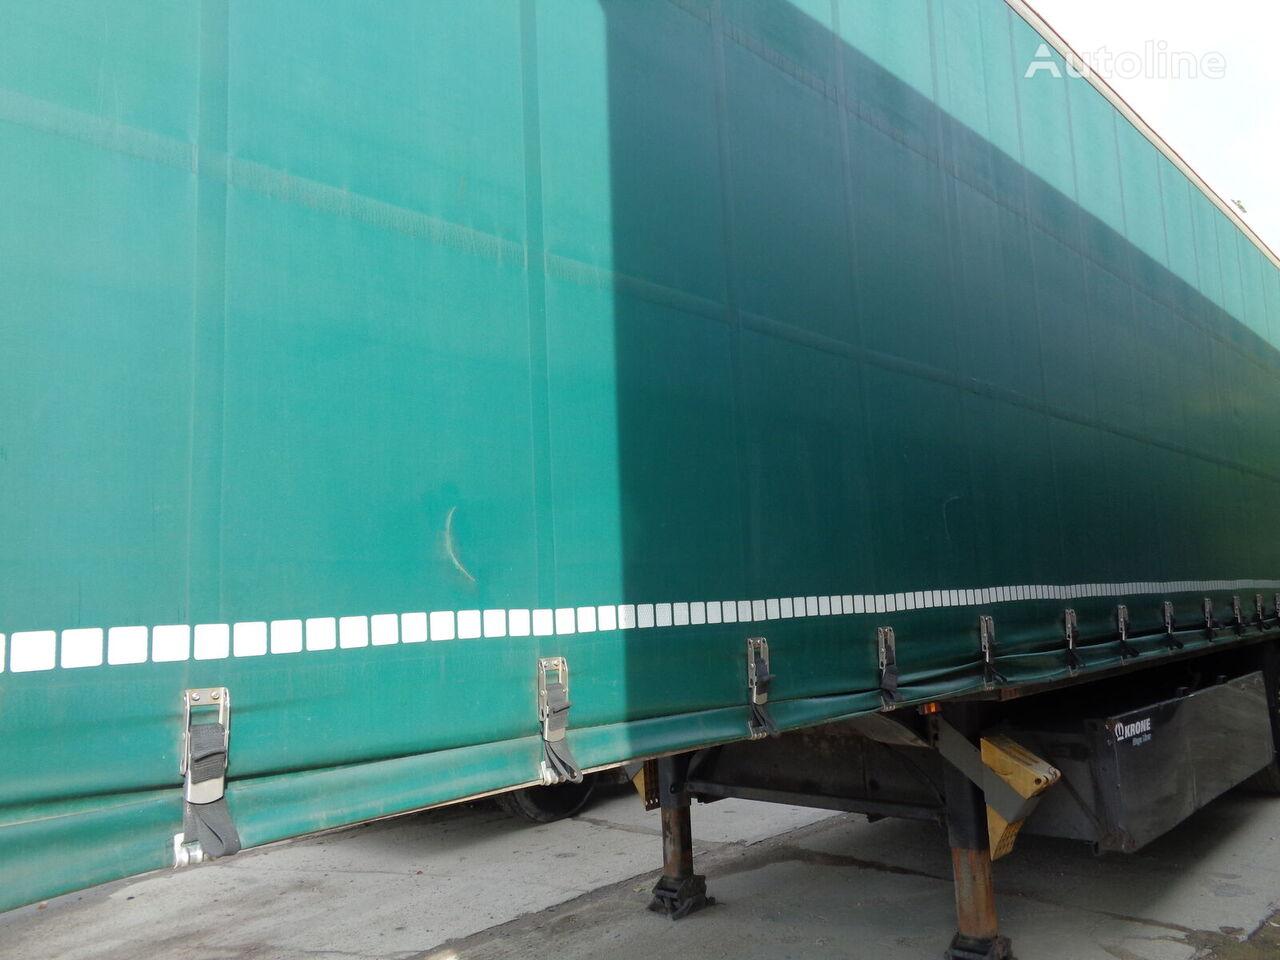 KRONE SDP 27 curtain side semi-trailer